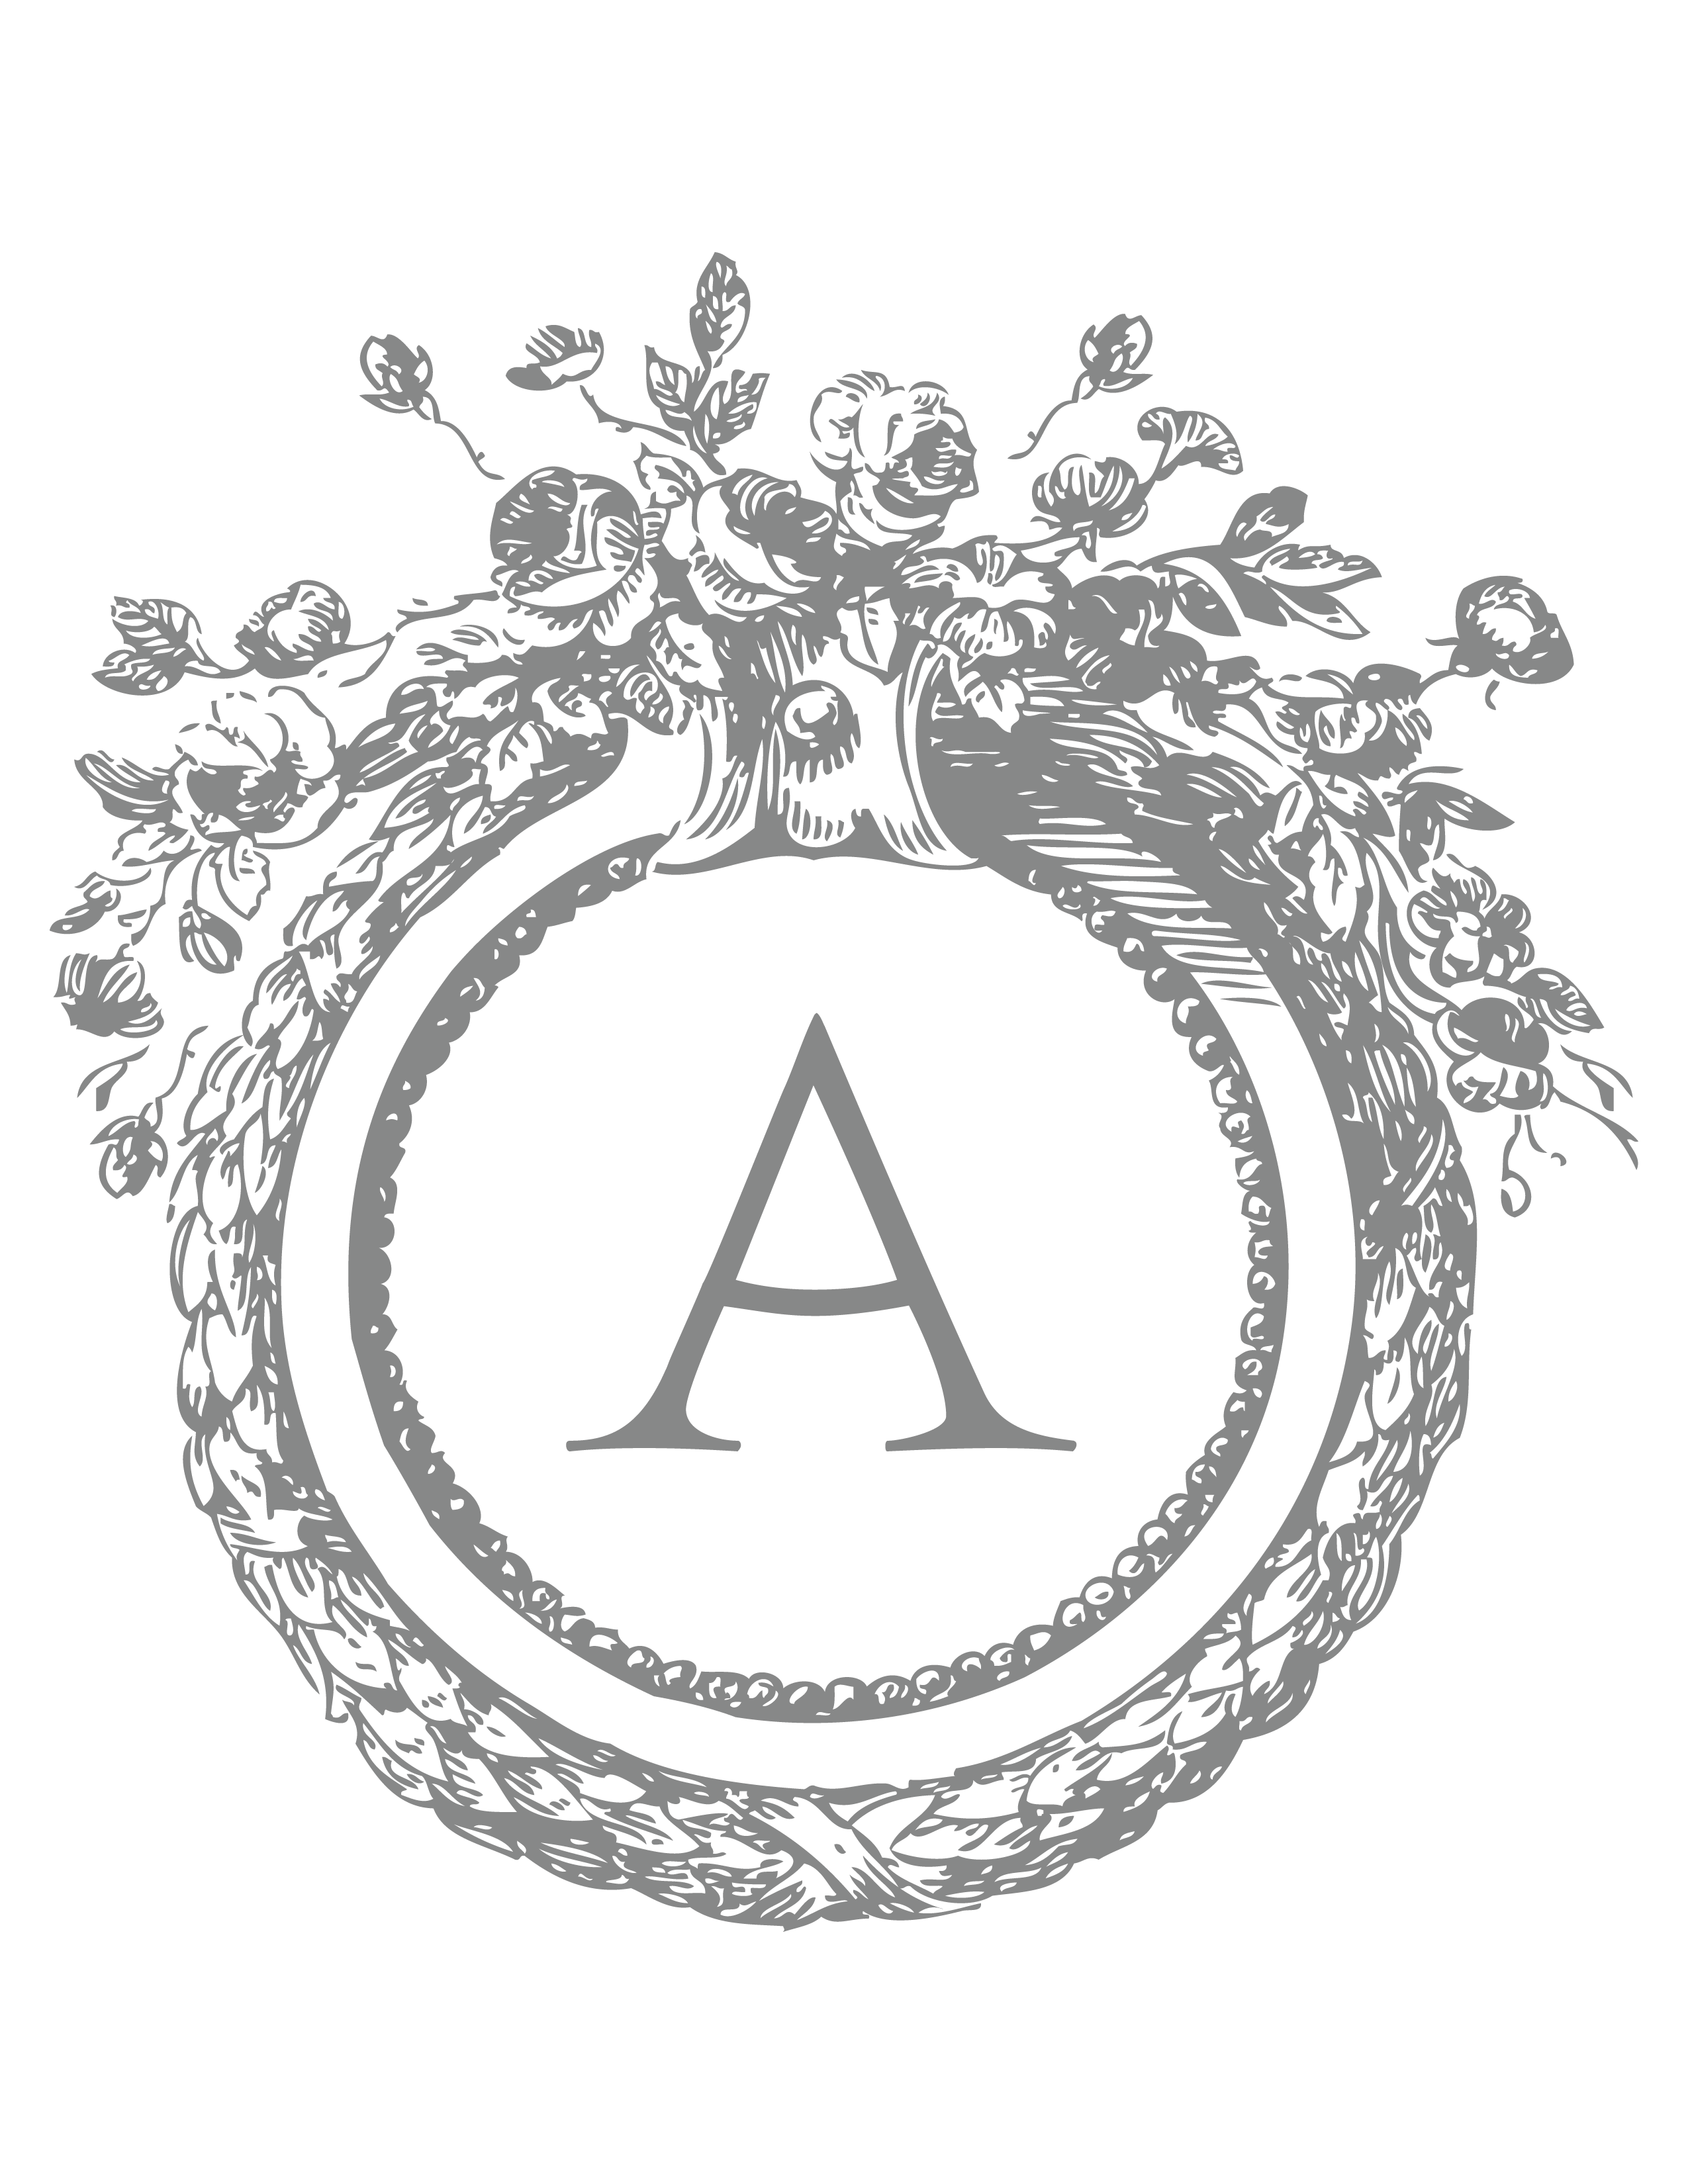 Monogram \'A\' via Martha Stewart Template. | Preppy girls | Pinterest ...